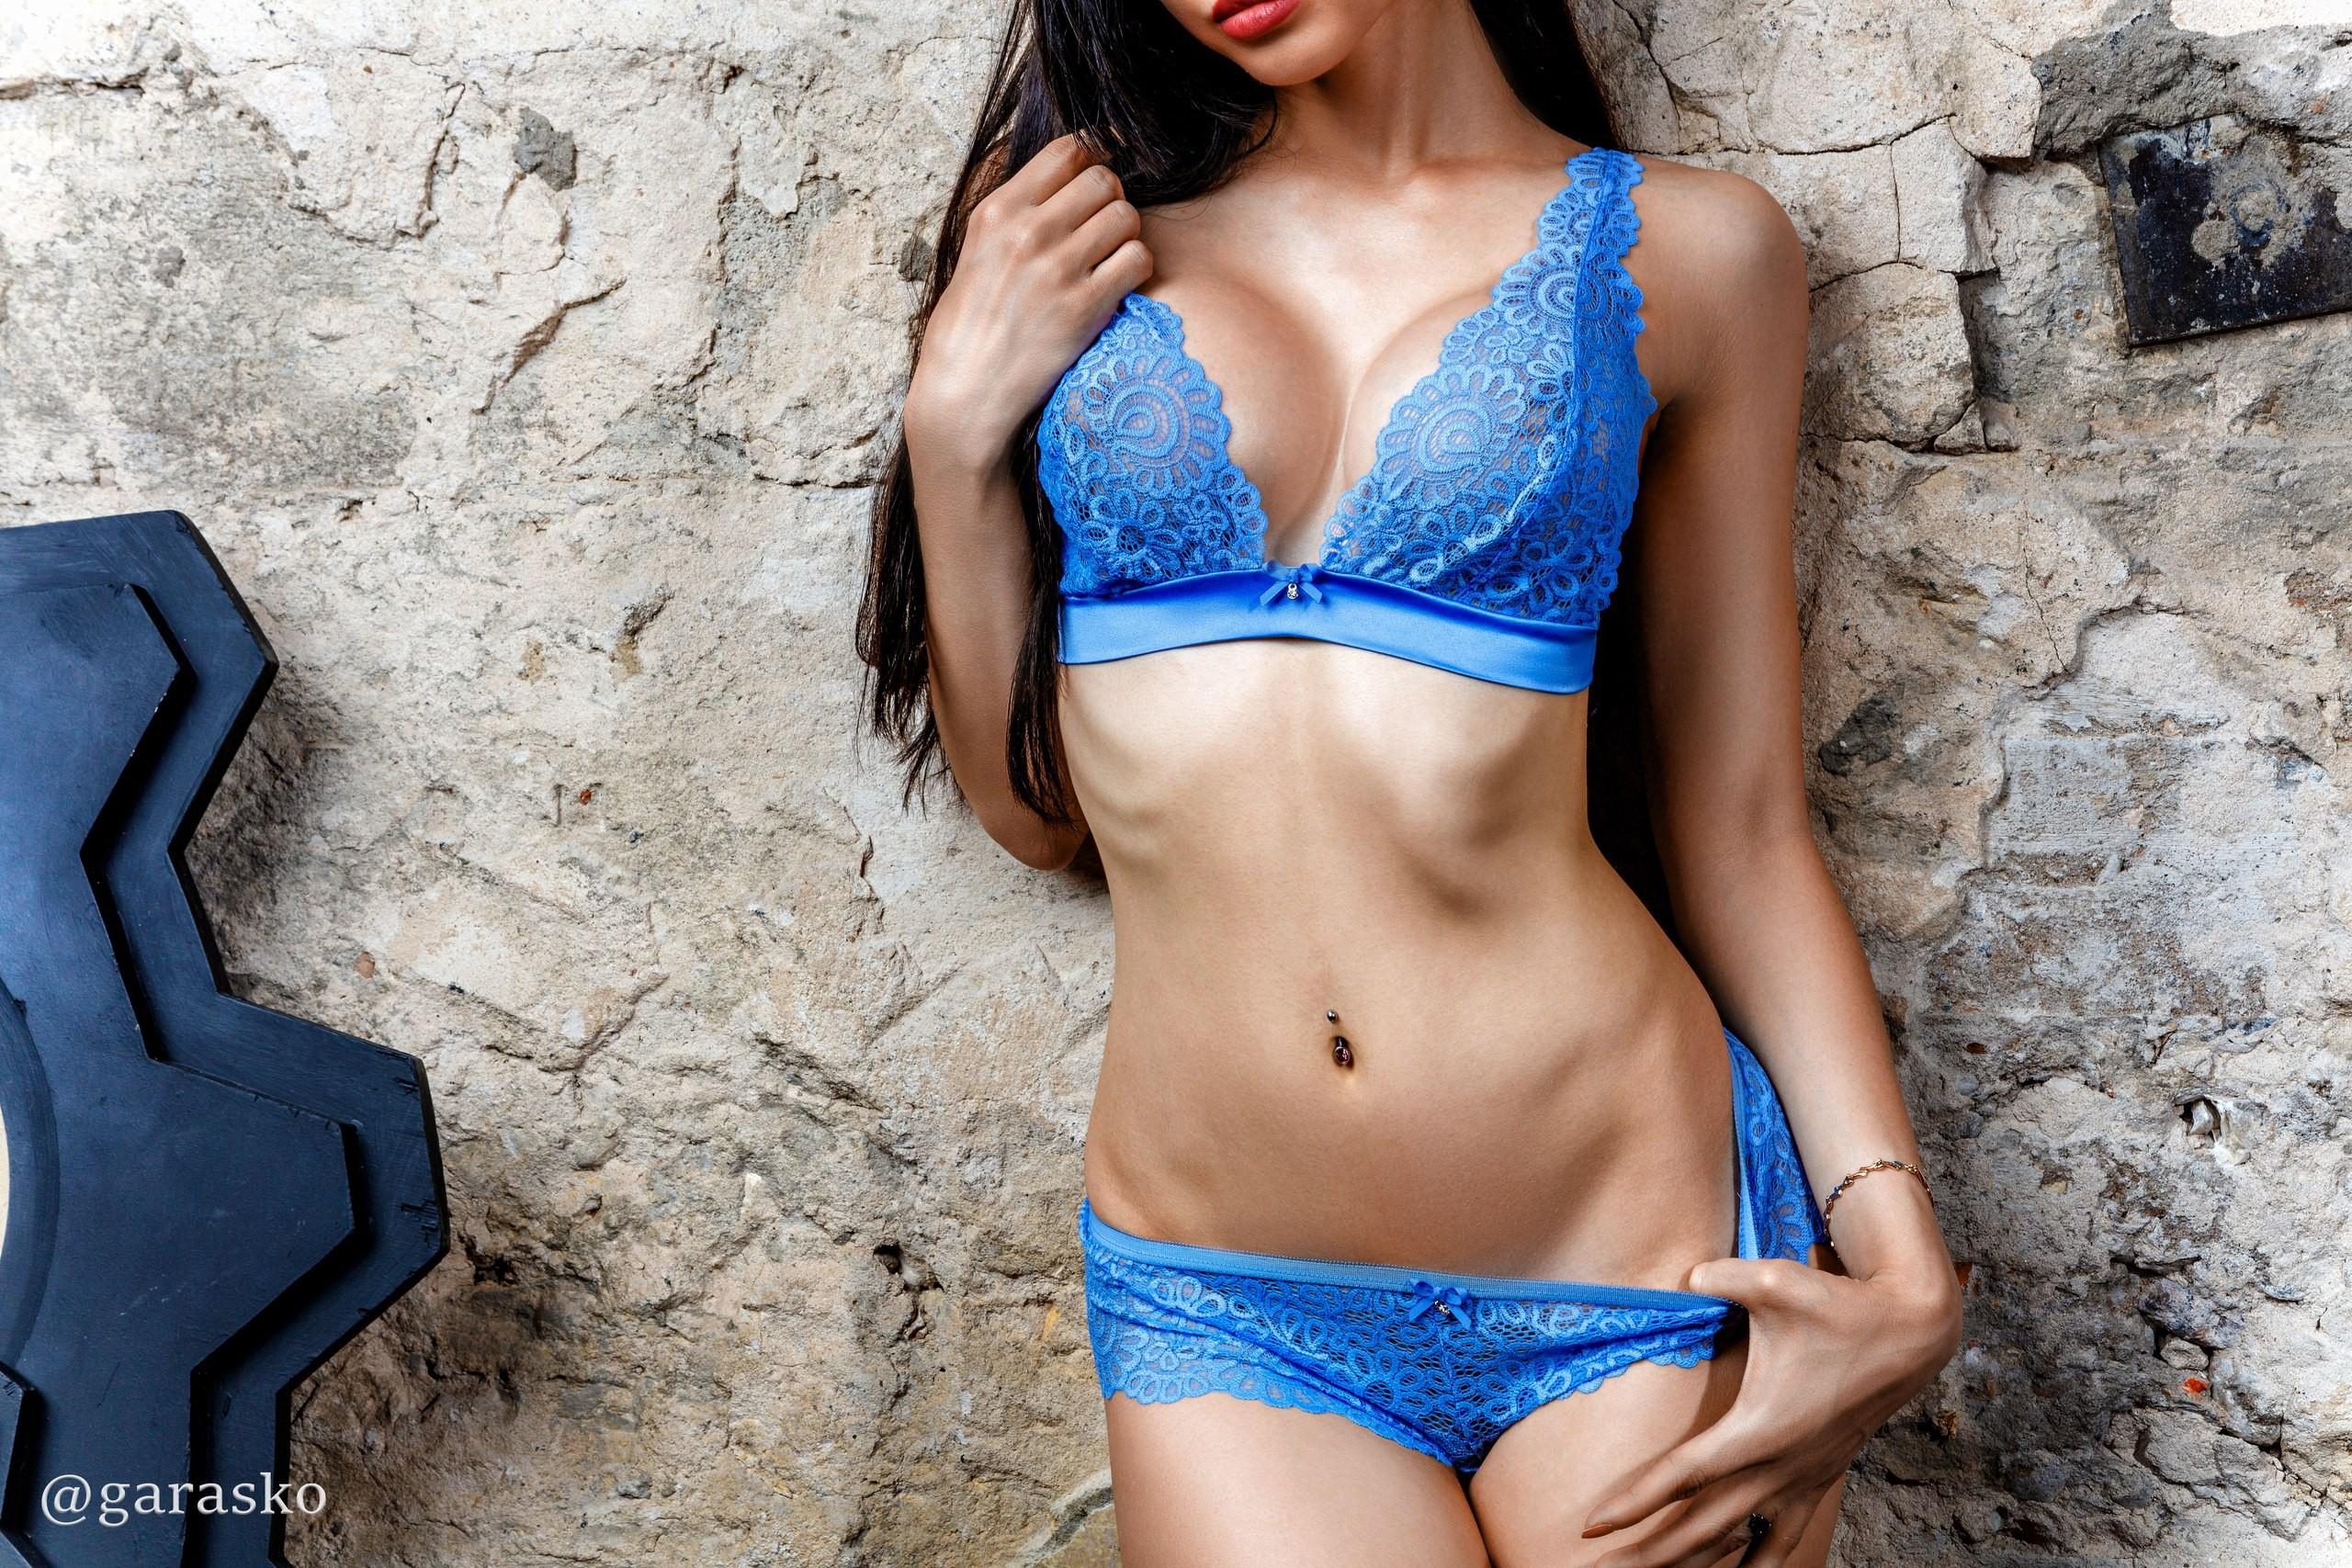 brand new 0c572 5a937 Hintergrundbilder : Frau, Modell-, Brünette, Mauer, blau ...